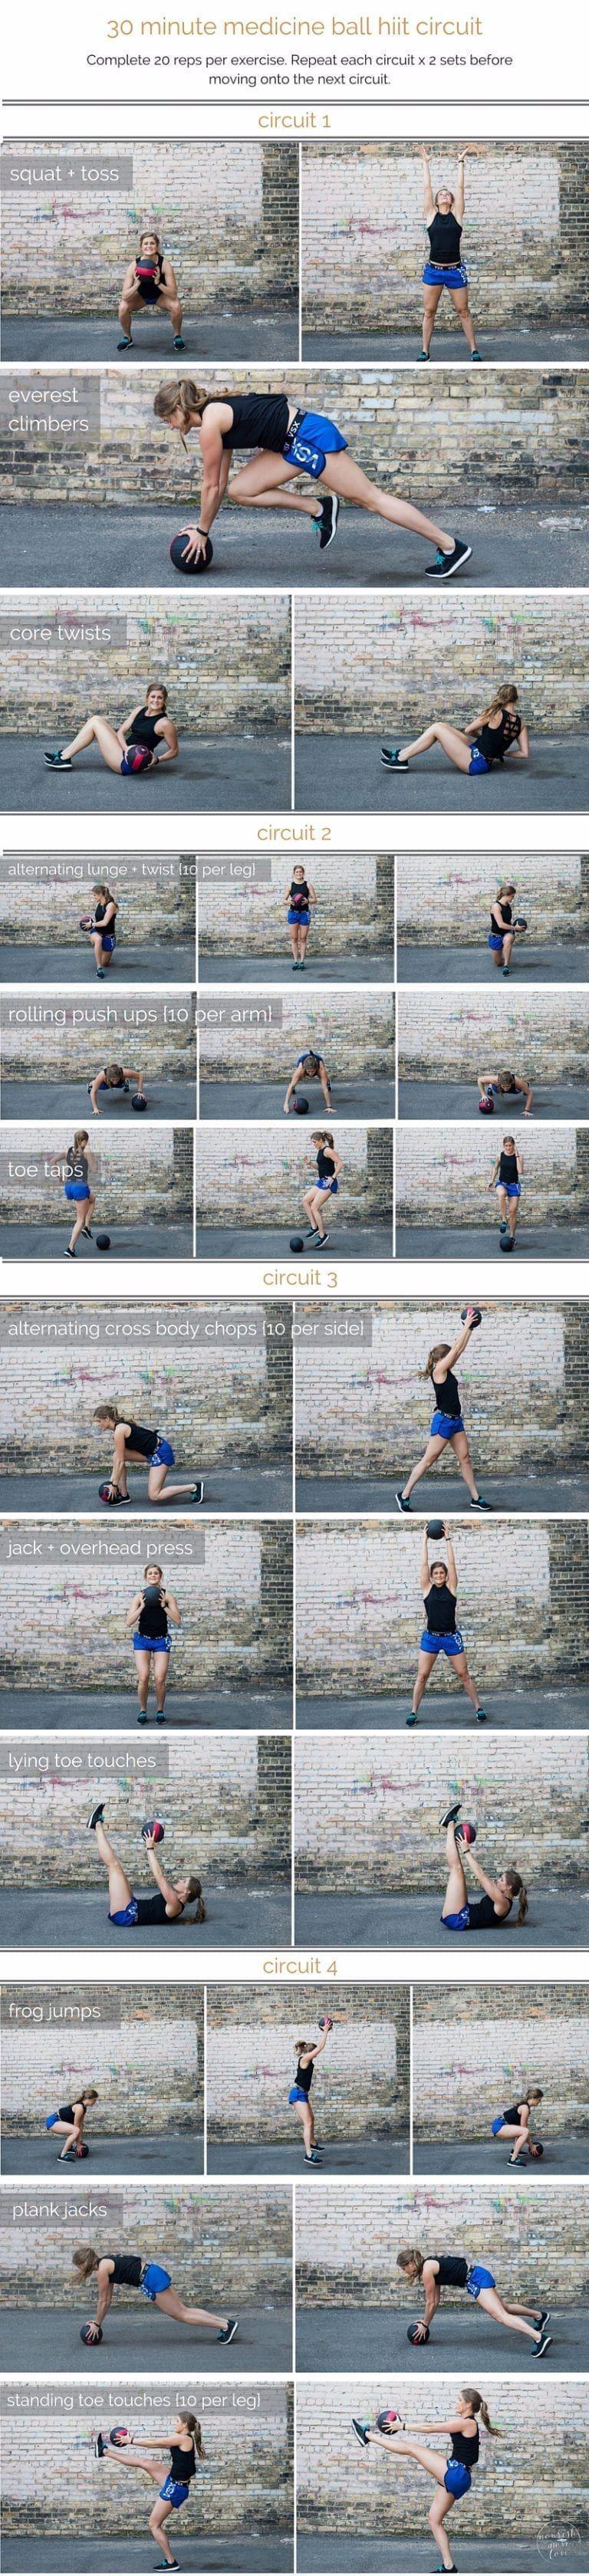 #Ball #Circuit #fitness #HIIT #langhantel #langhantel fitness #Love #medicine #Ball #Circuit #HIIT #...